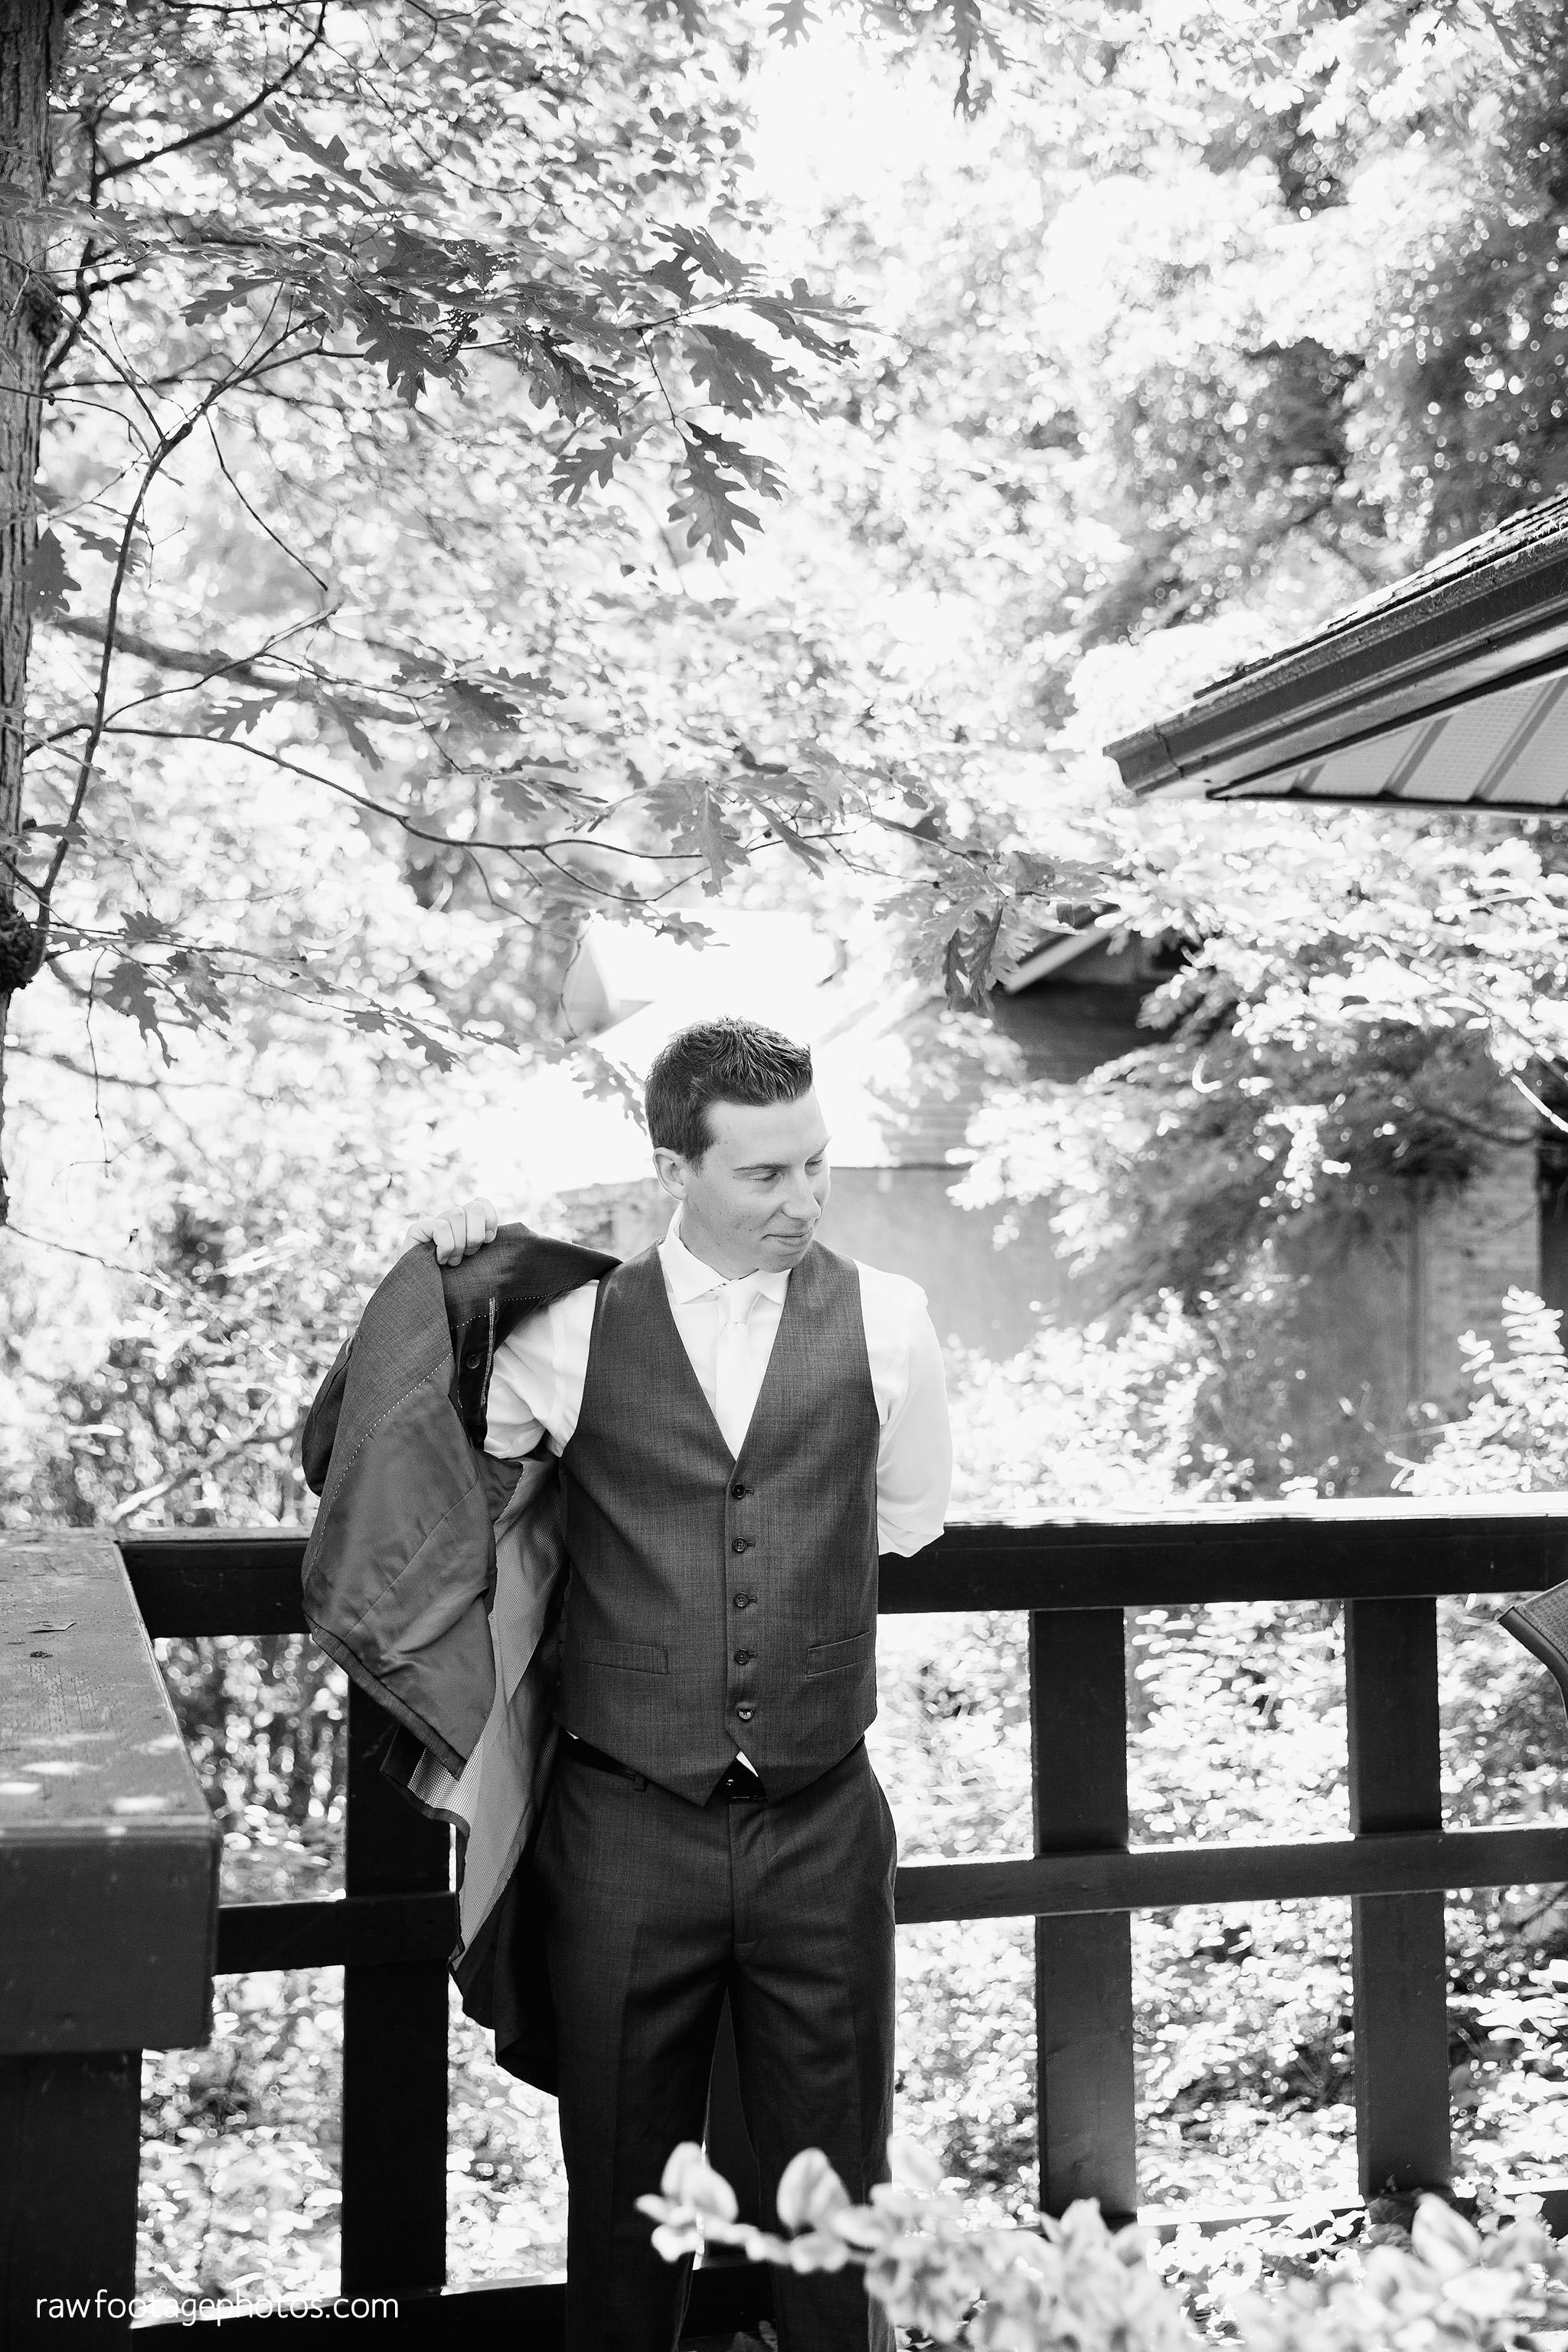 london_ontario_wedding_photographer-grand_bend_wedding_photographer-oakwood_resort_wedding-beach_wedding-sunset_wedding-raw_footage_photography007.jpg